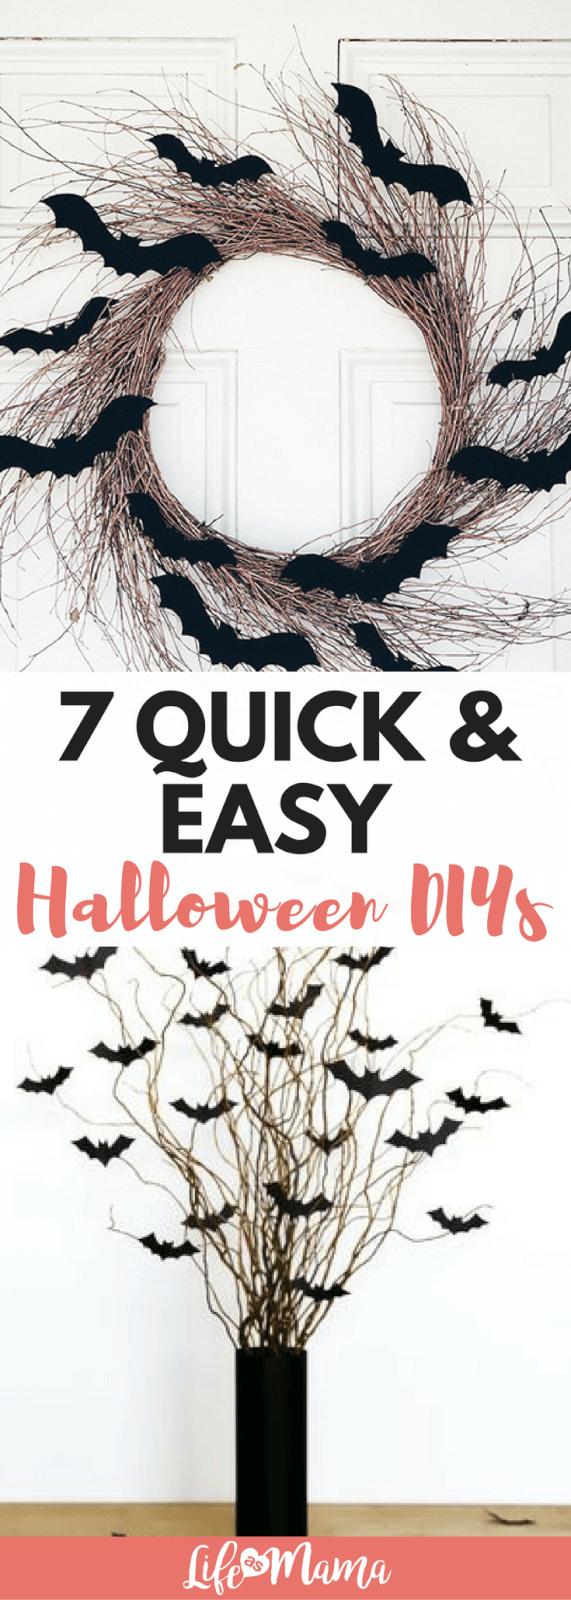 7 quick easy halloween diys